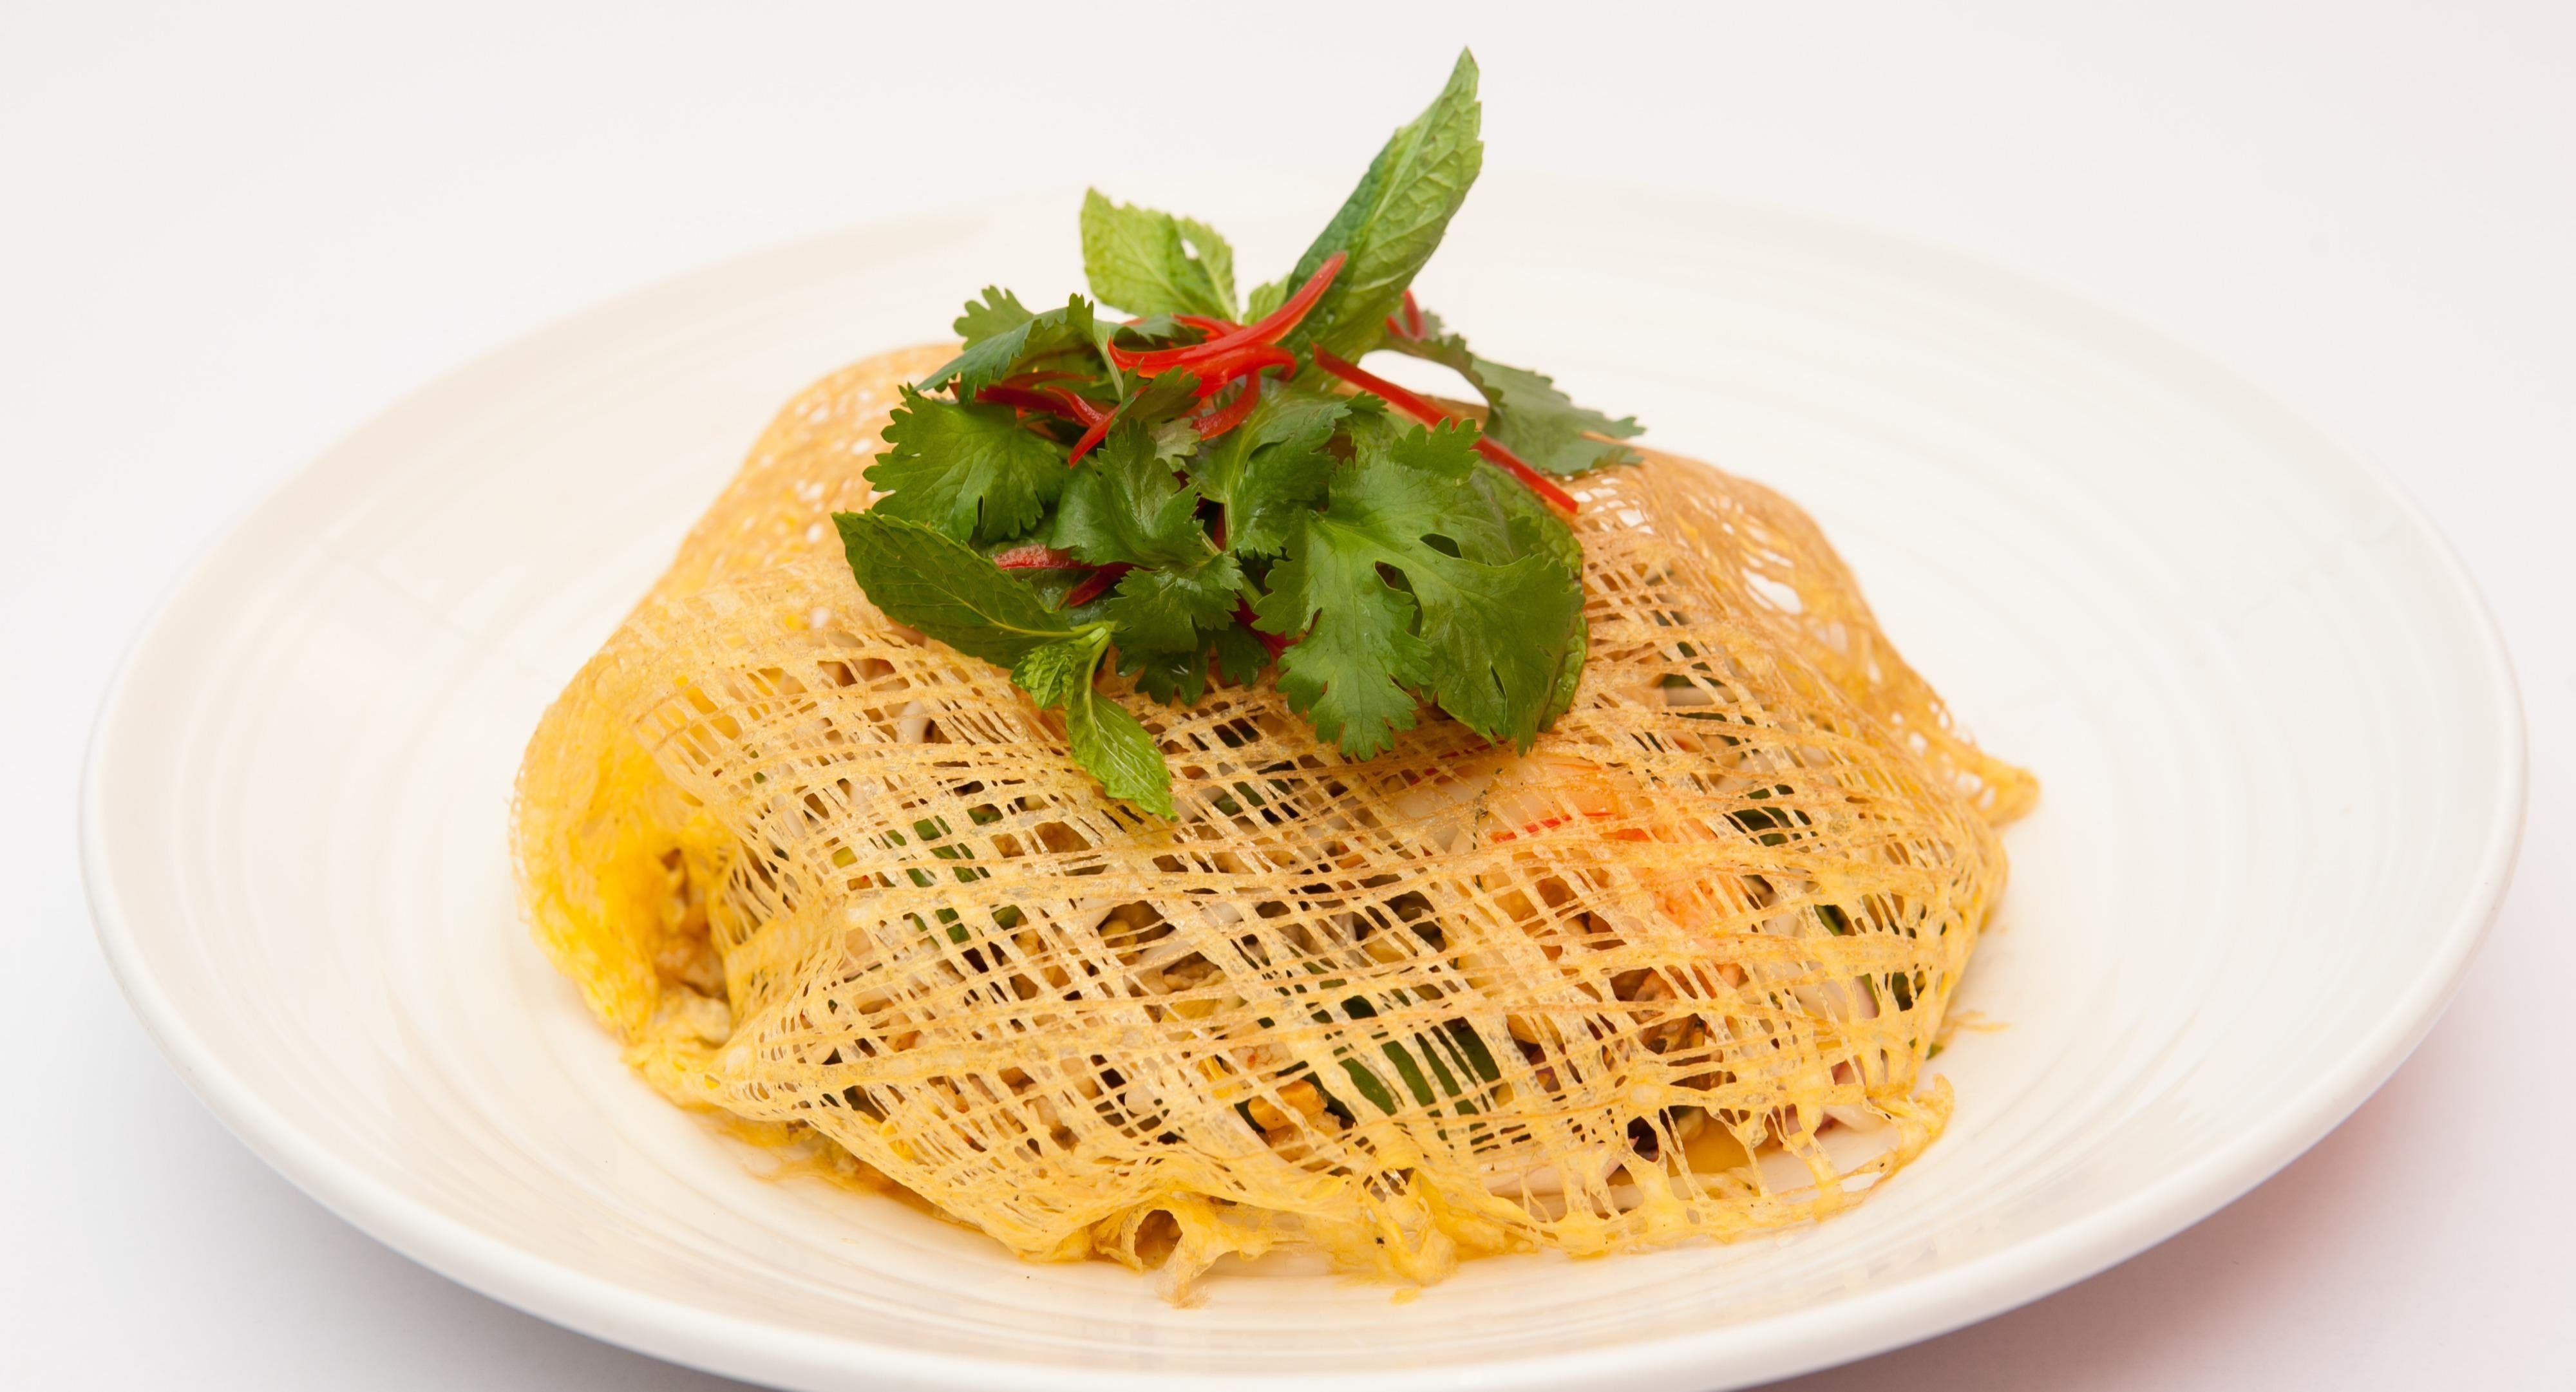 Manly Thai Gourmet